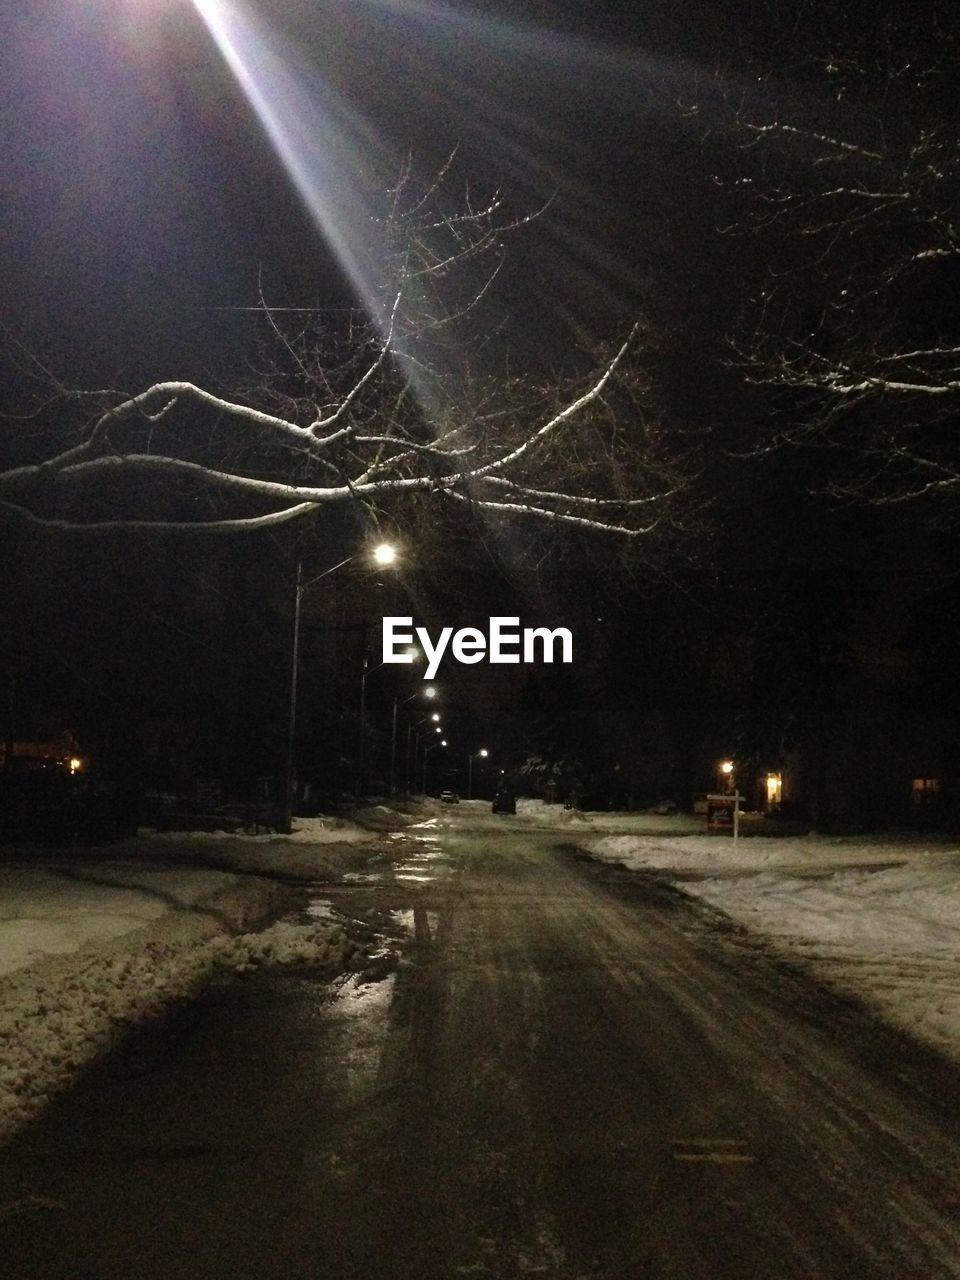 night, illuminated, tree, street light, street, the way forward, outdoors, road, winter, cold temperature, snow, no people, nature, bare tree, sky, city